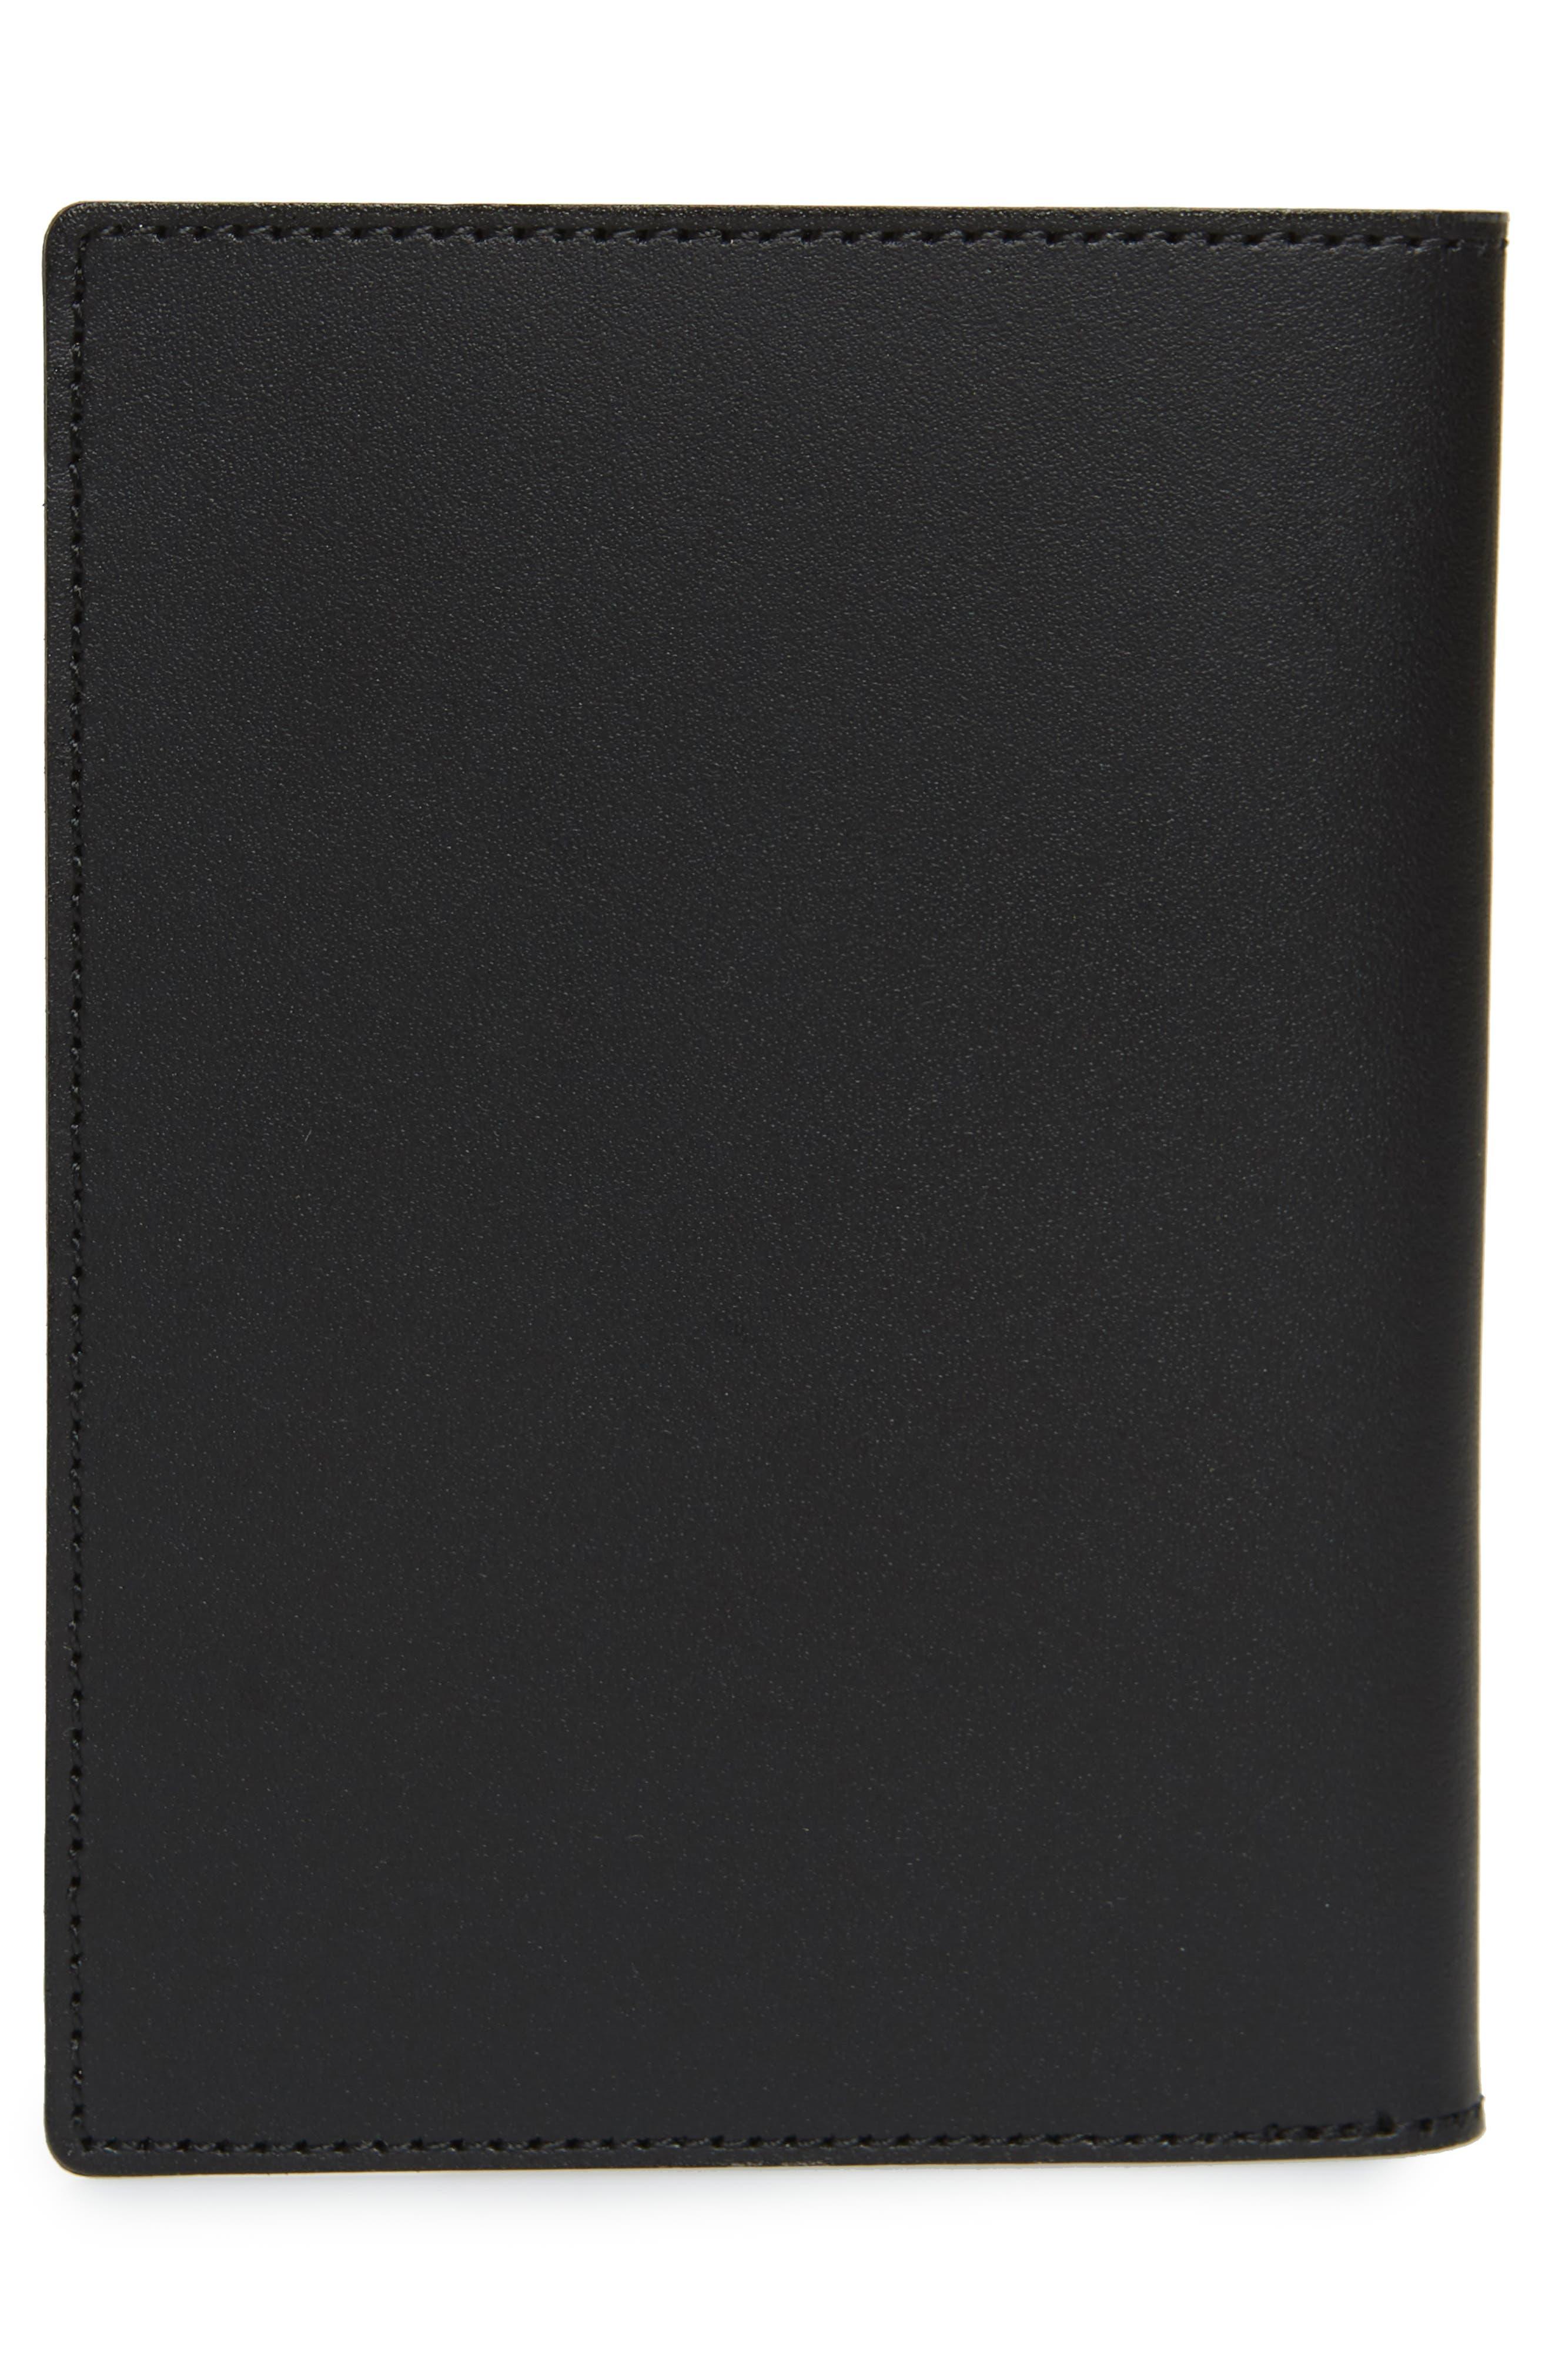 SATURDAYS NYC, Leather Passport Wallet, Alternate thumbnail 3, color, BLACK